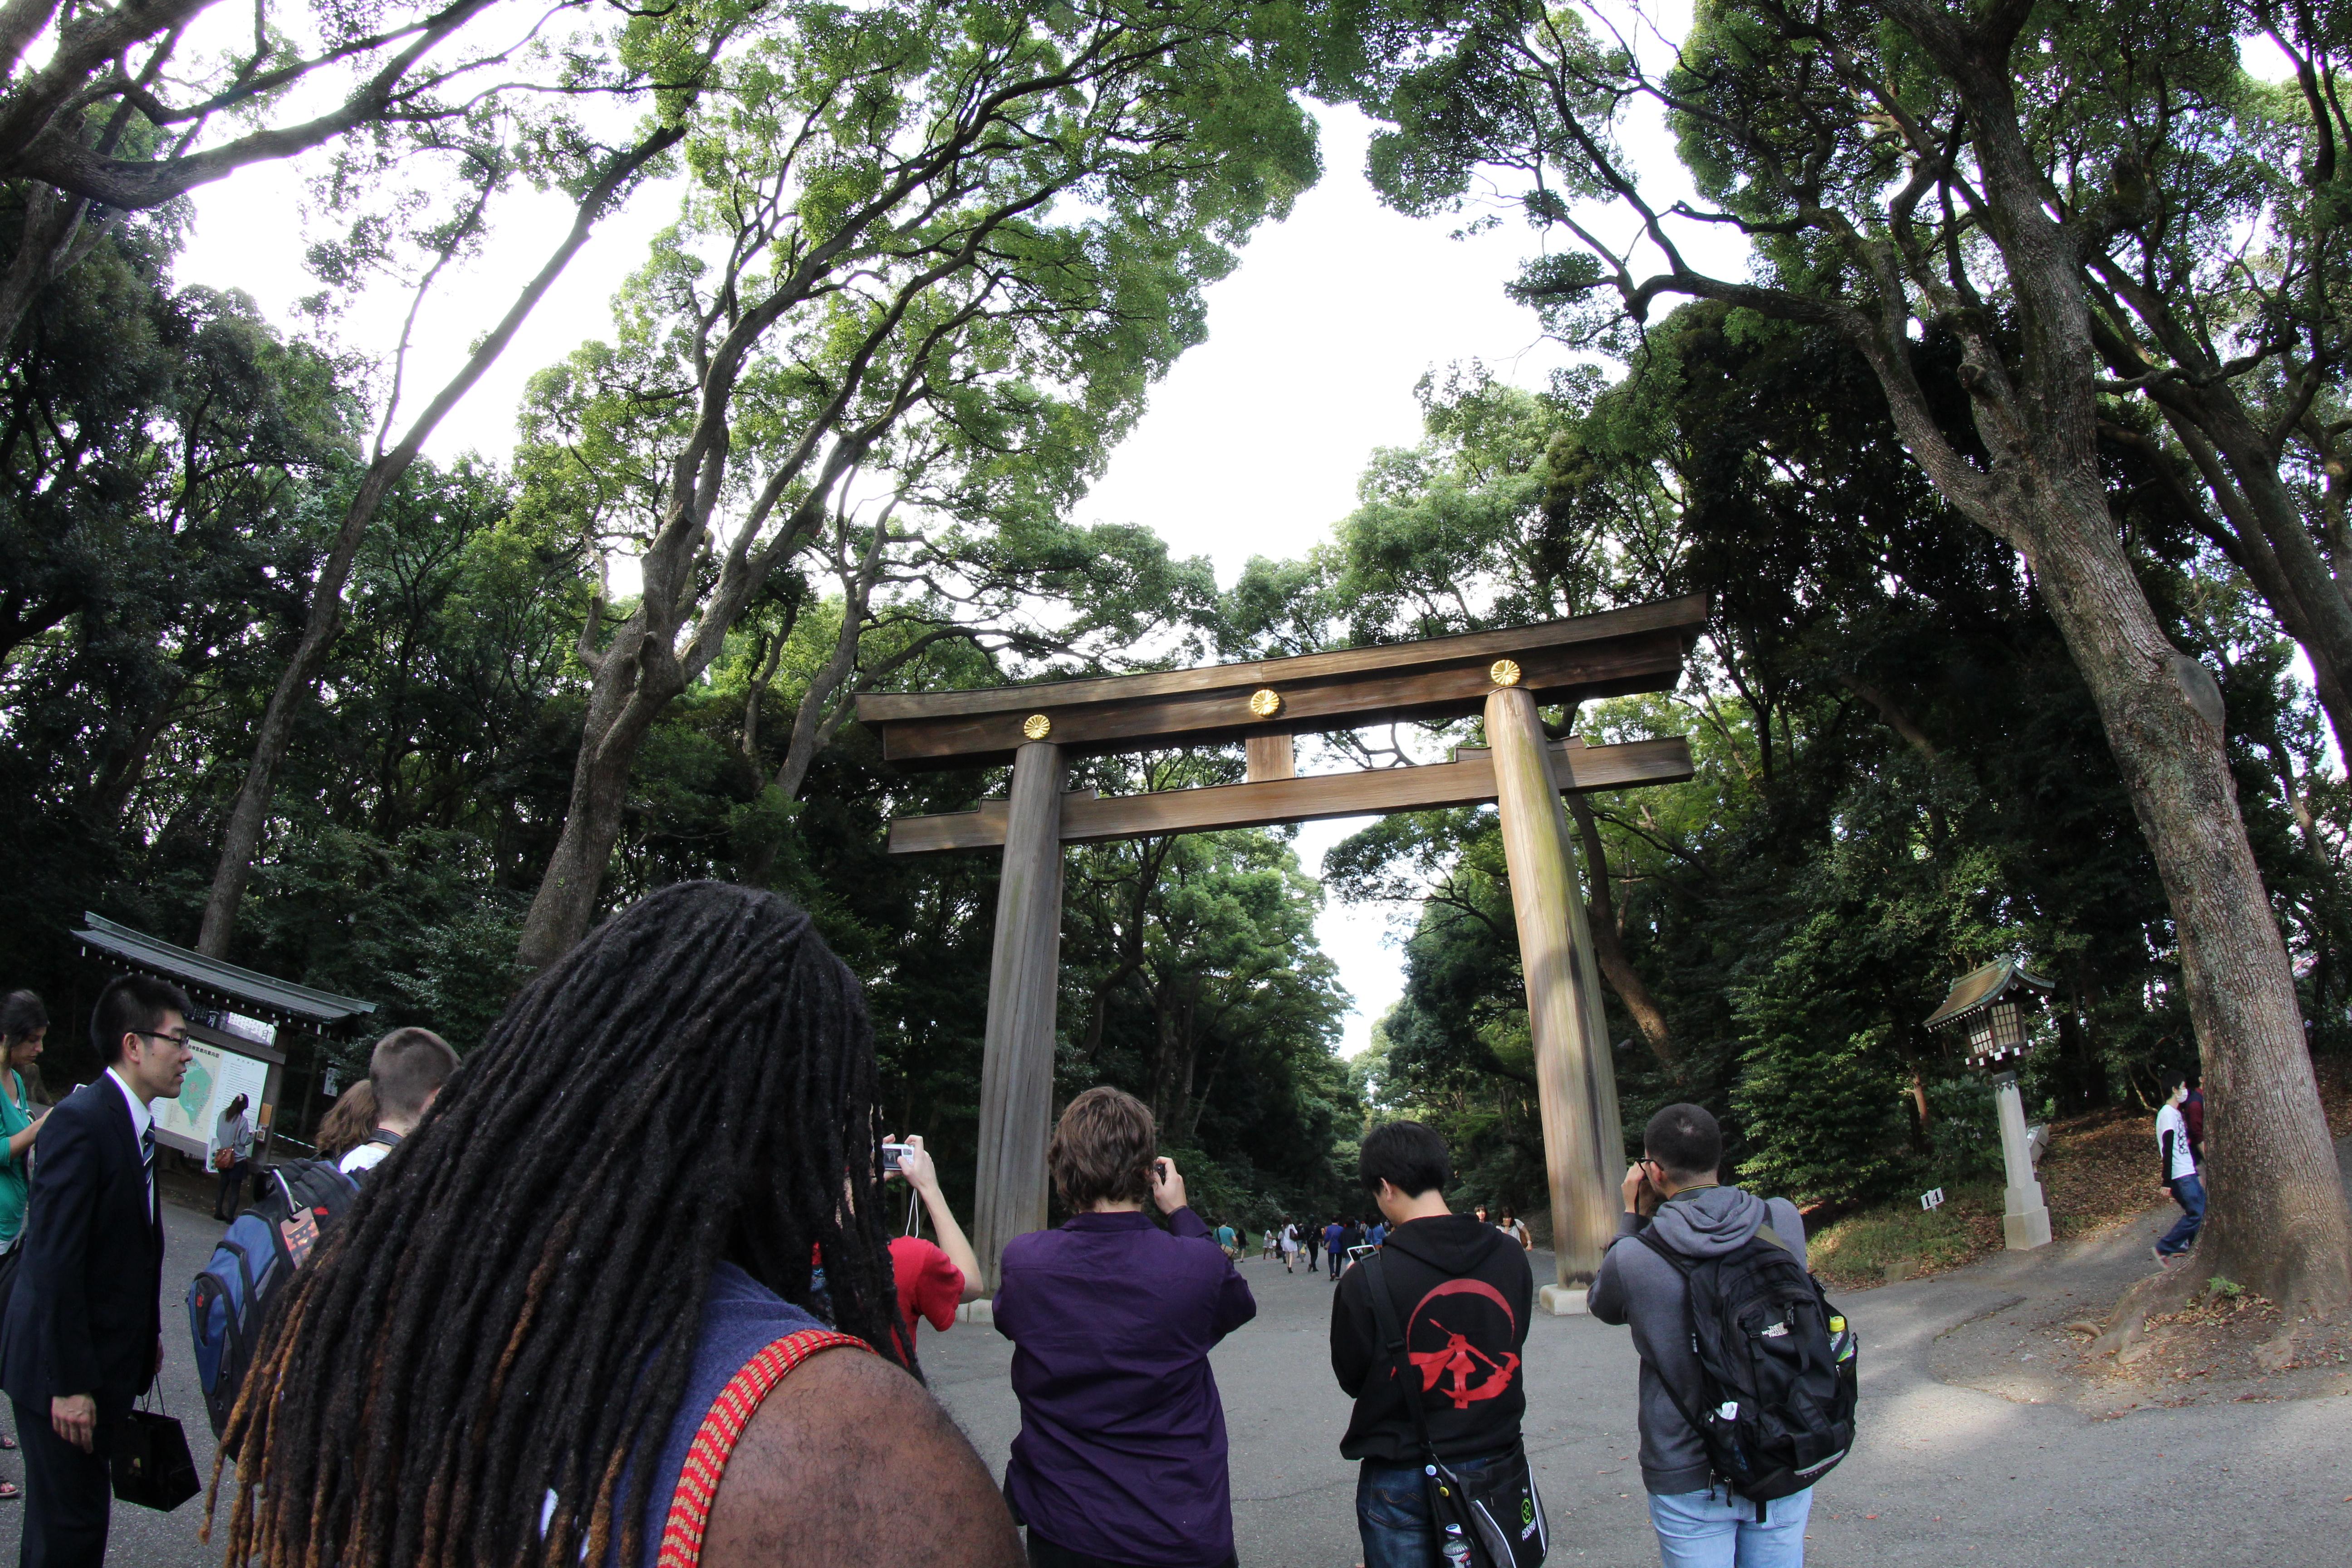 KCP Japanese Language School! Trip to Meiji Jingu Shrine and Takeshita Dori.